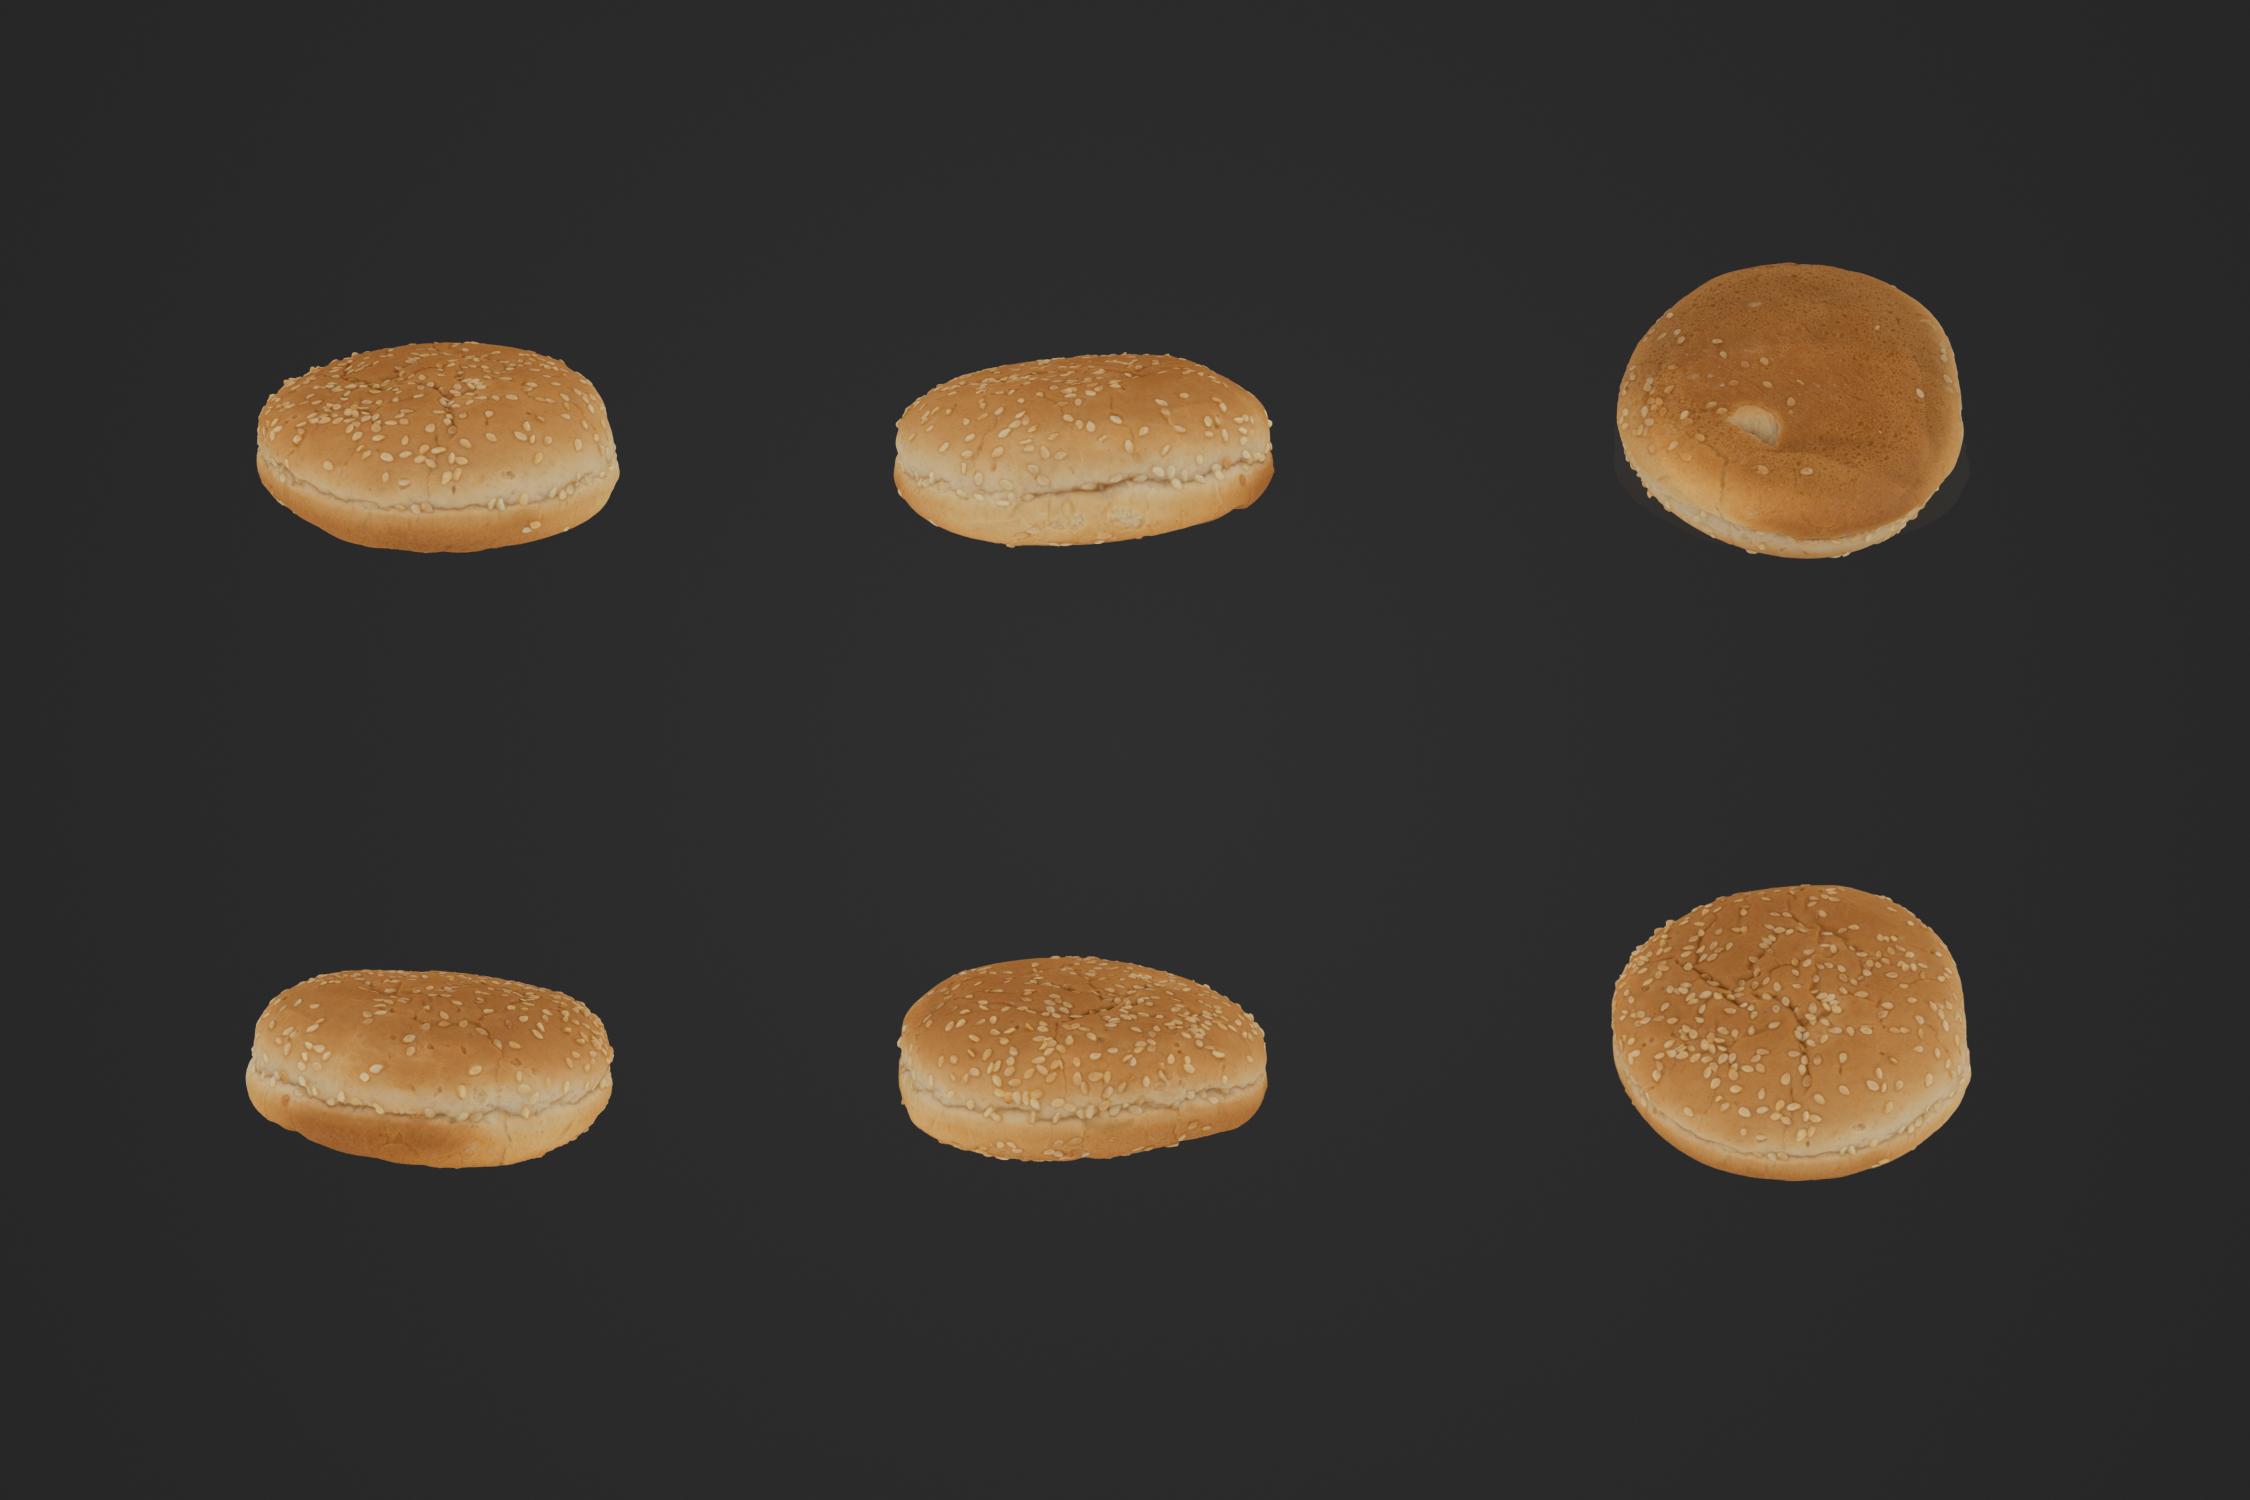 Burger_Bun_2_Preview_1.jpg